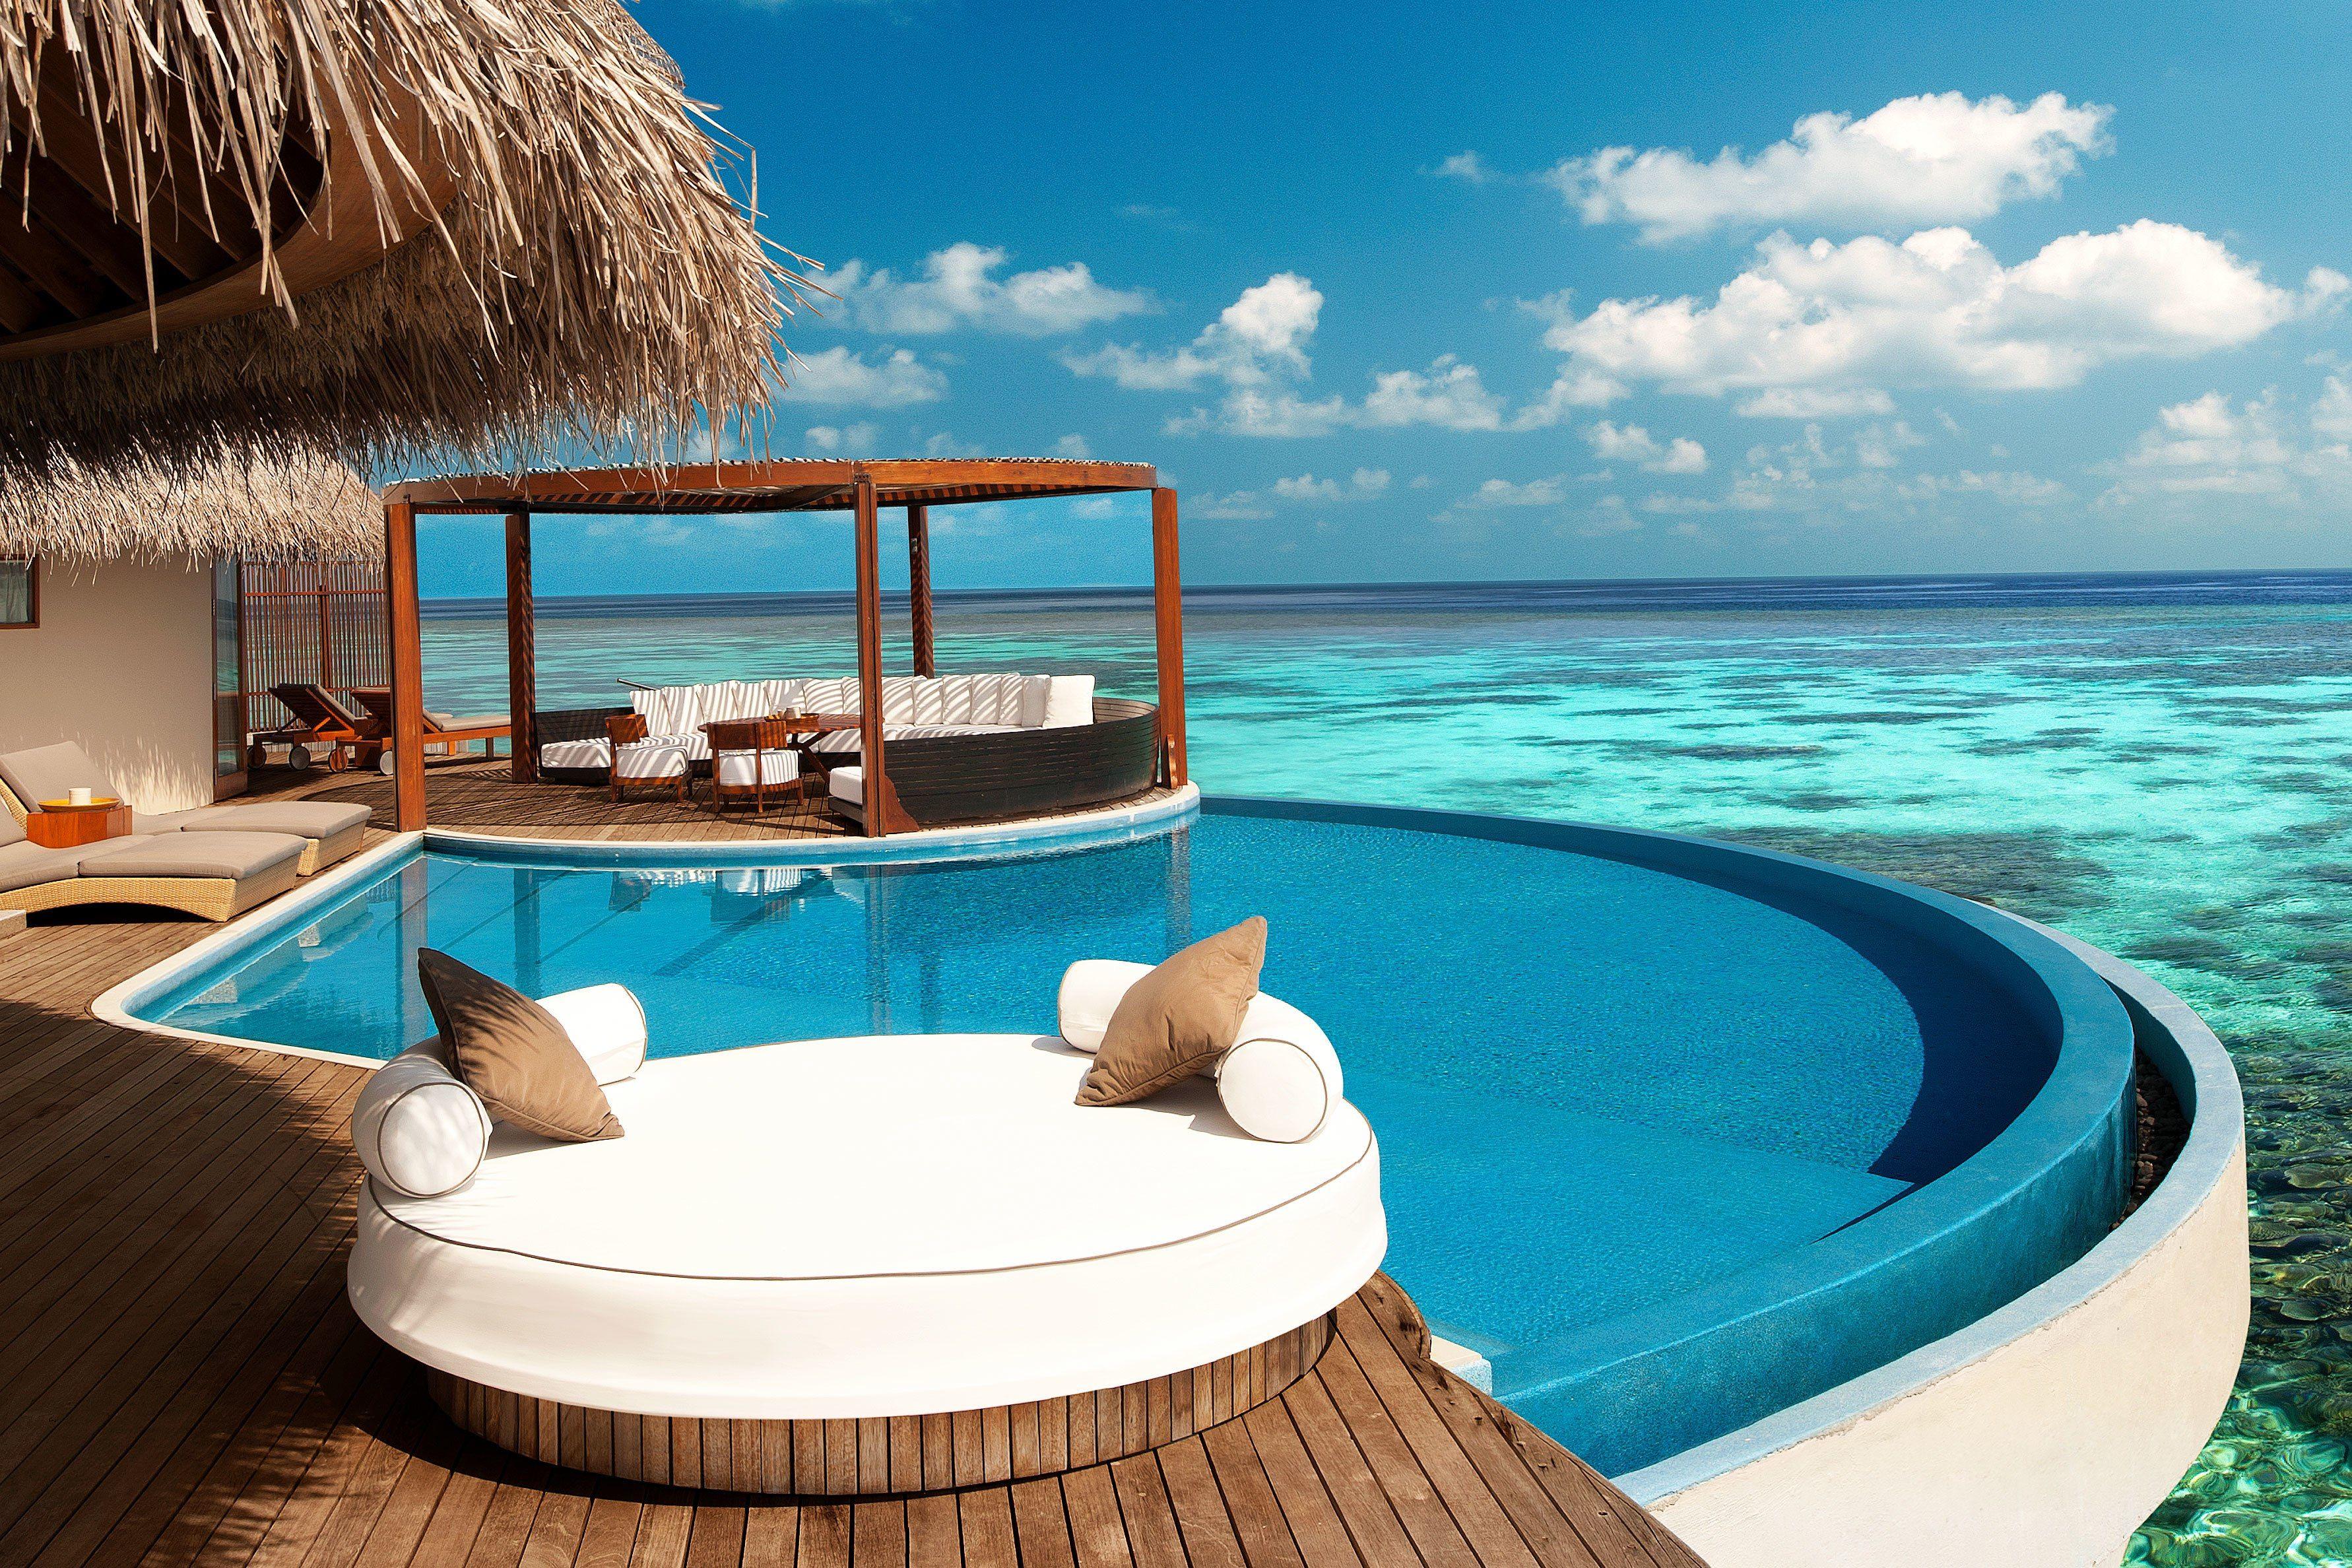 Pompano Beach Oceanfront Hotel Fort Lauderdale Marriott Pompano Beach Resort Marriott Hotels Marriott Resorts Resort